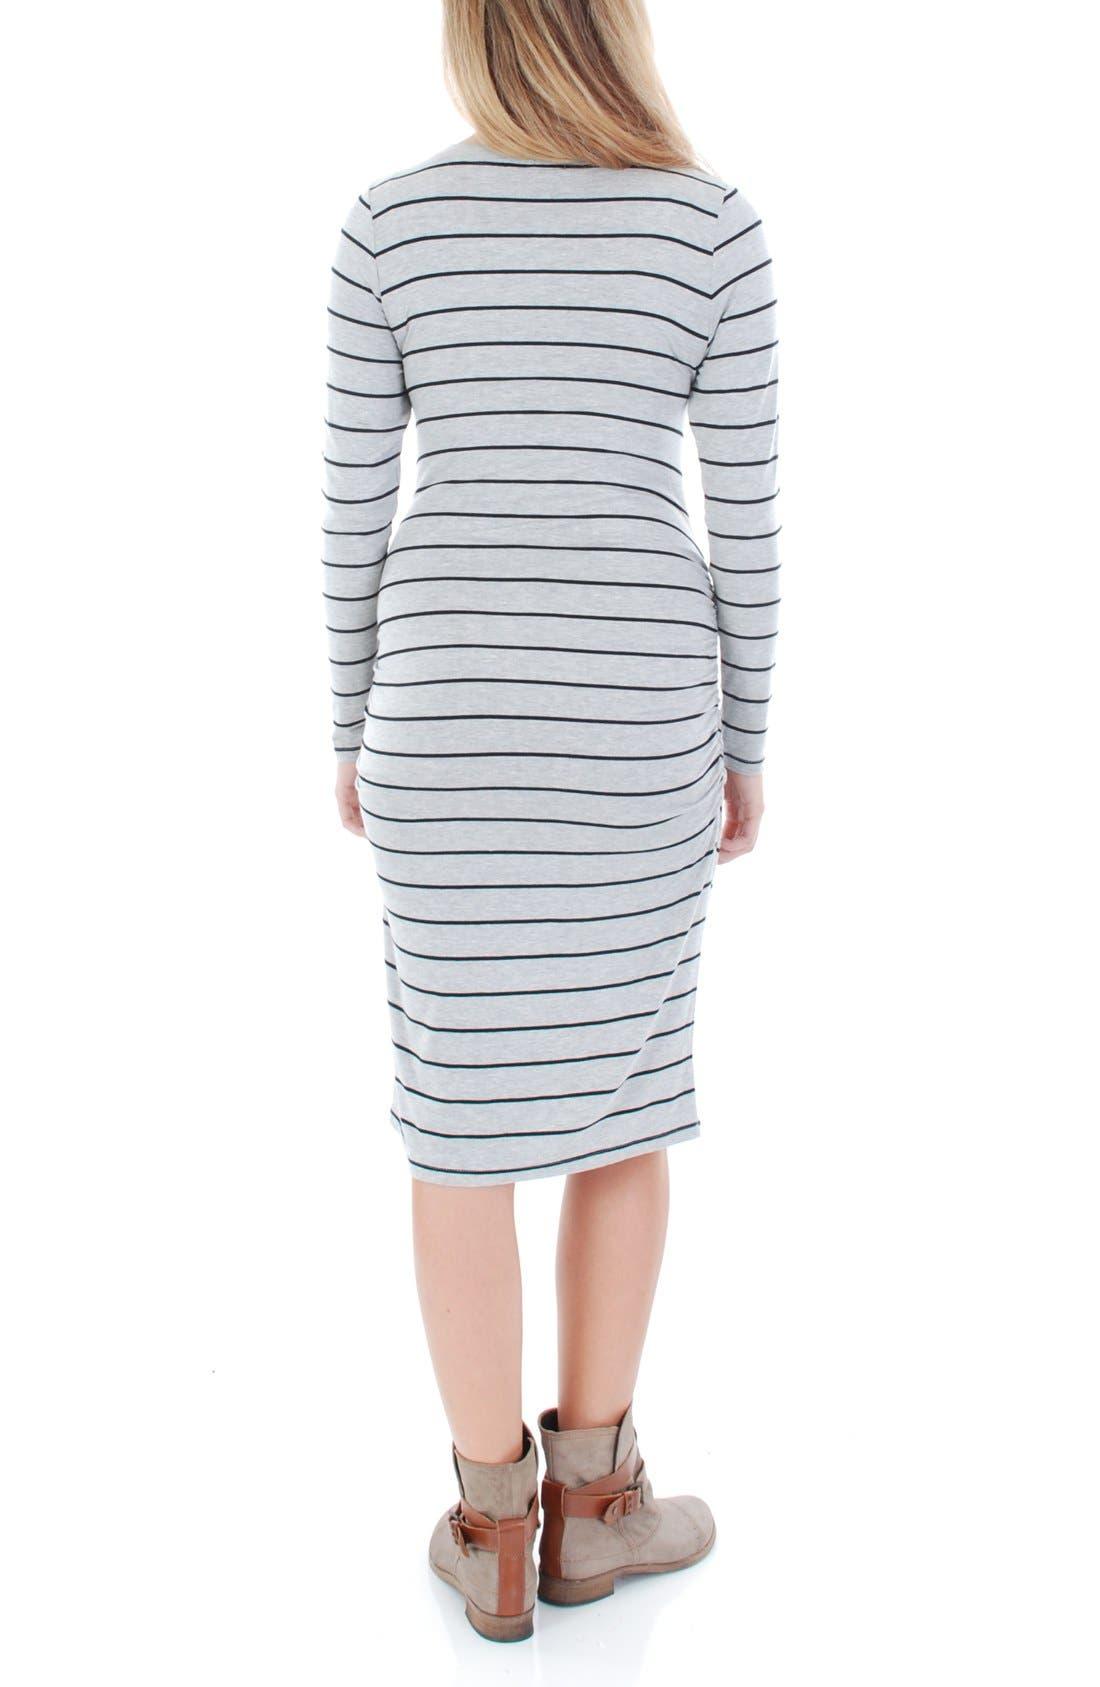 EverlyGrey 'Hanh' Maternity T-Shirt Dress,                             Alternate thumbnail 2, color,                             GREY STRIPE